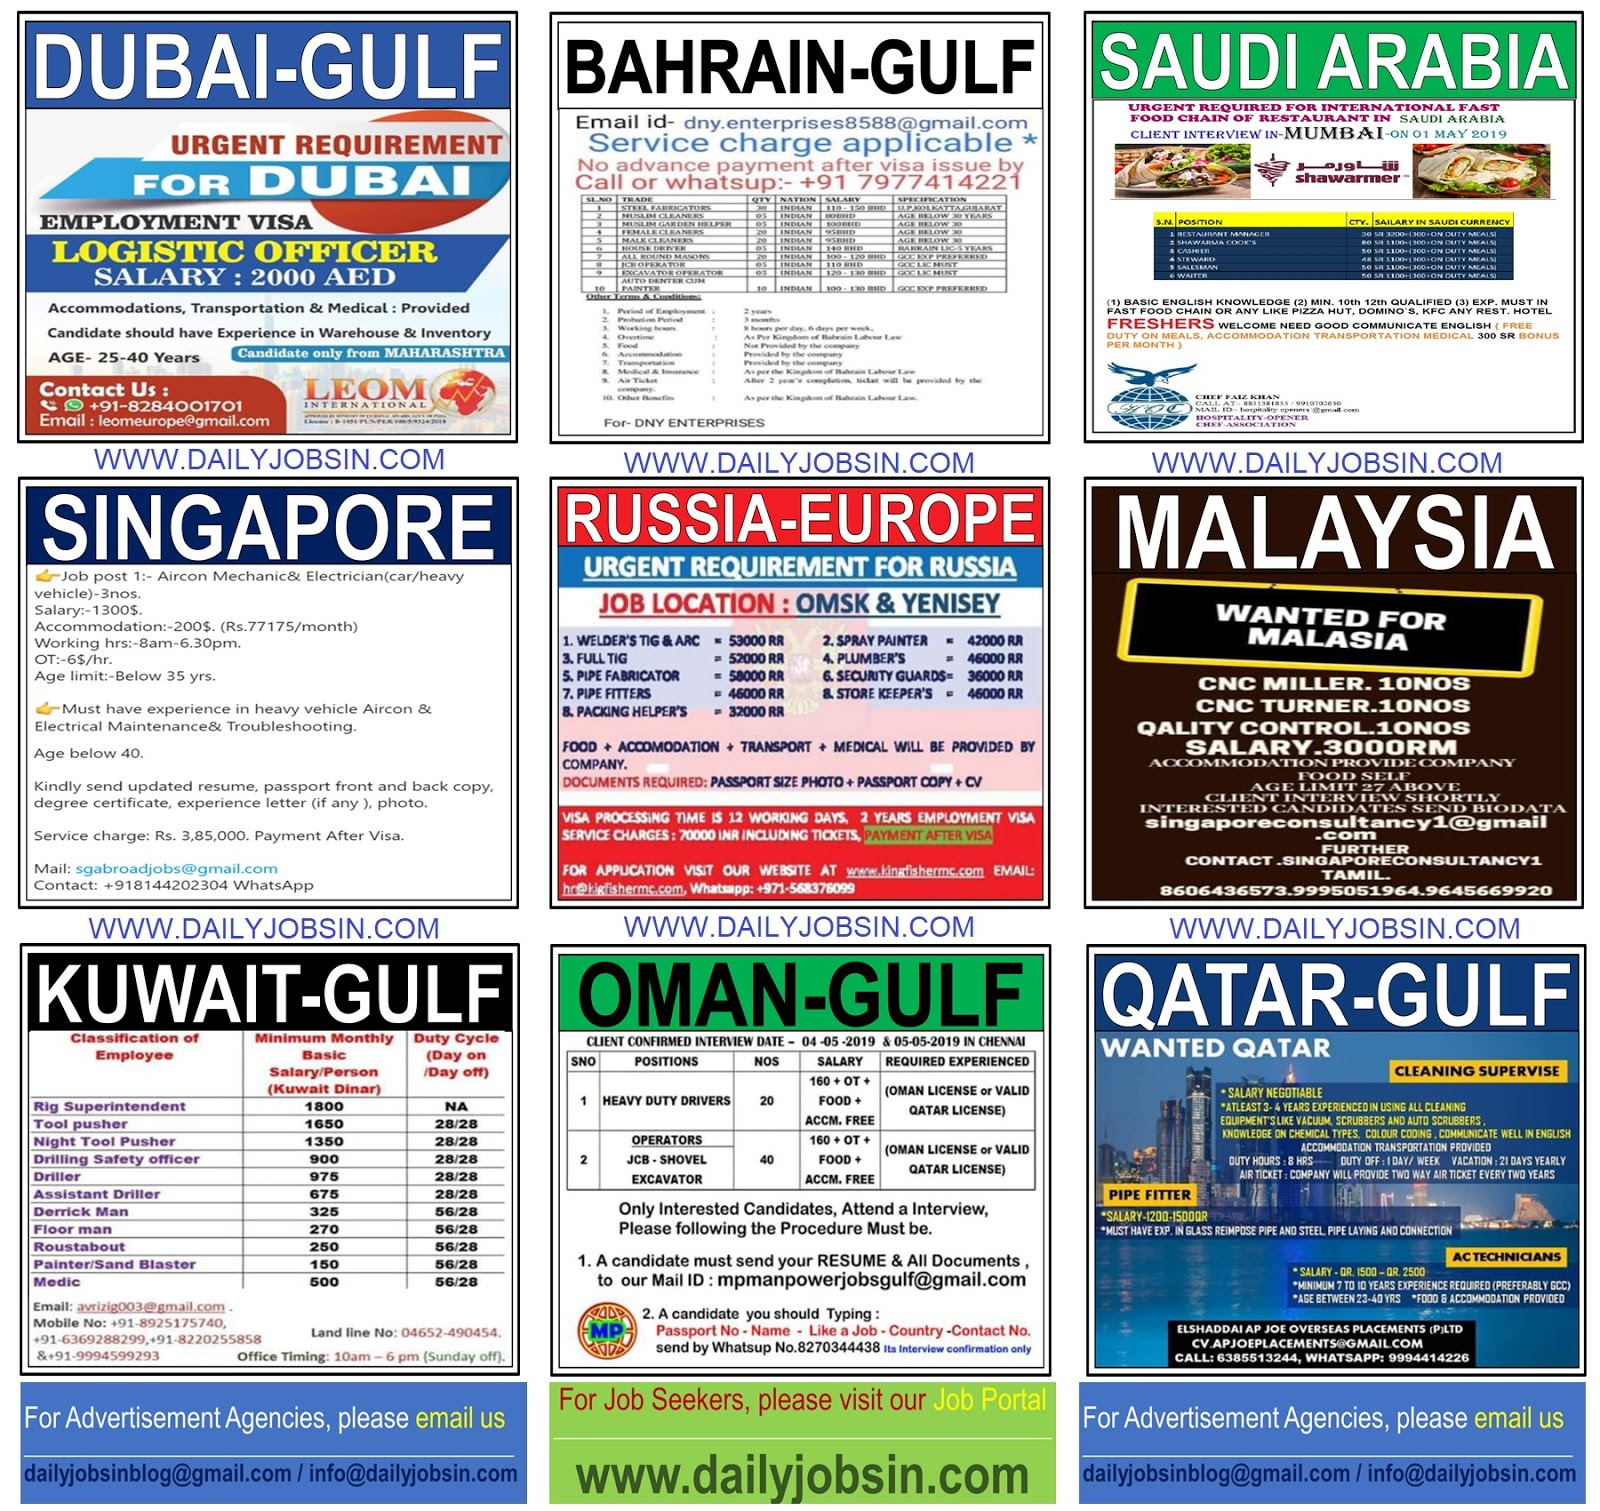 JOBS IN SINGAPORE, RUSSIA-EUROPE, MALAYSIA & GULF COUNTRIES ||